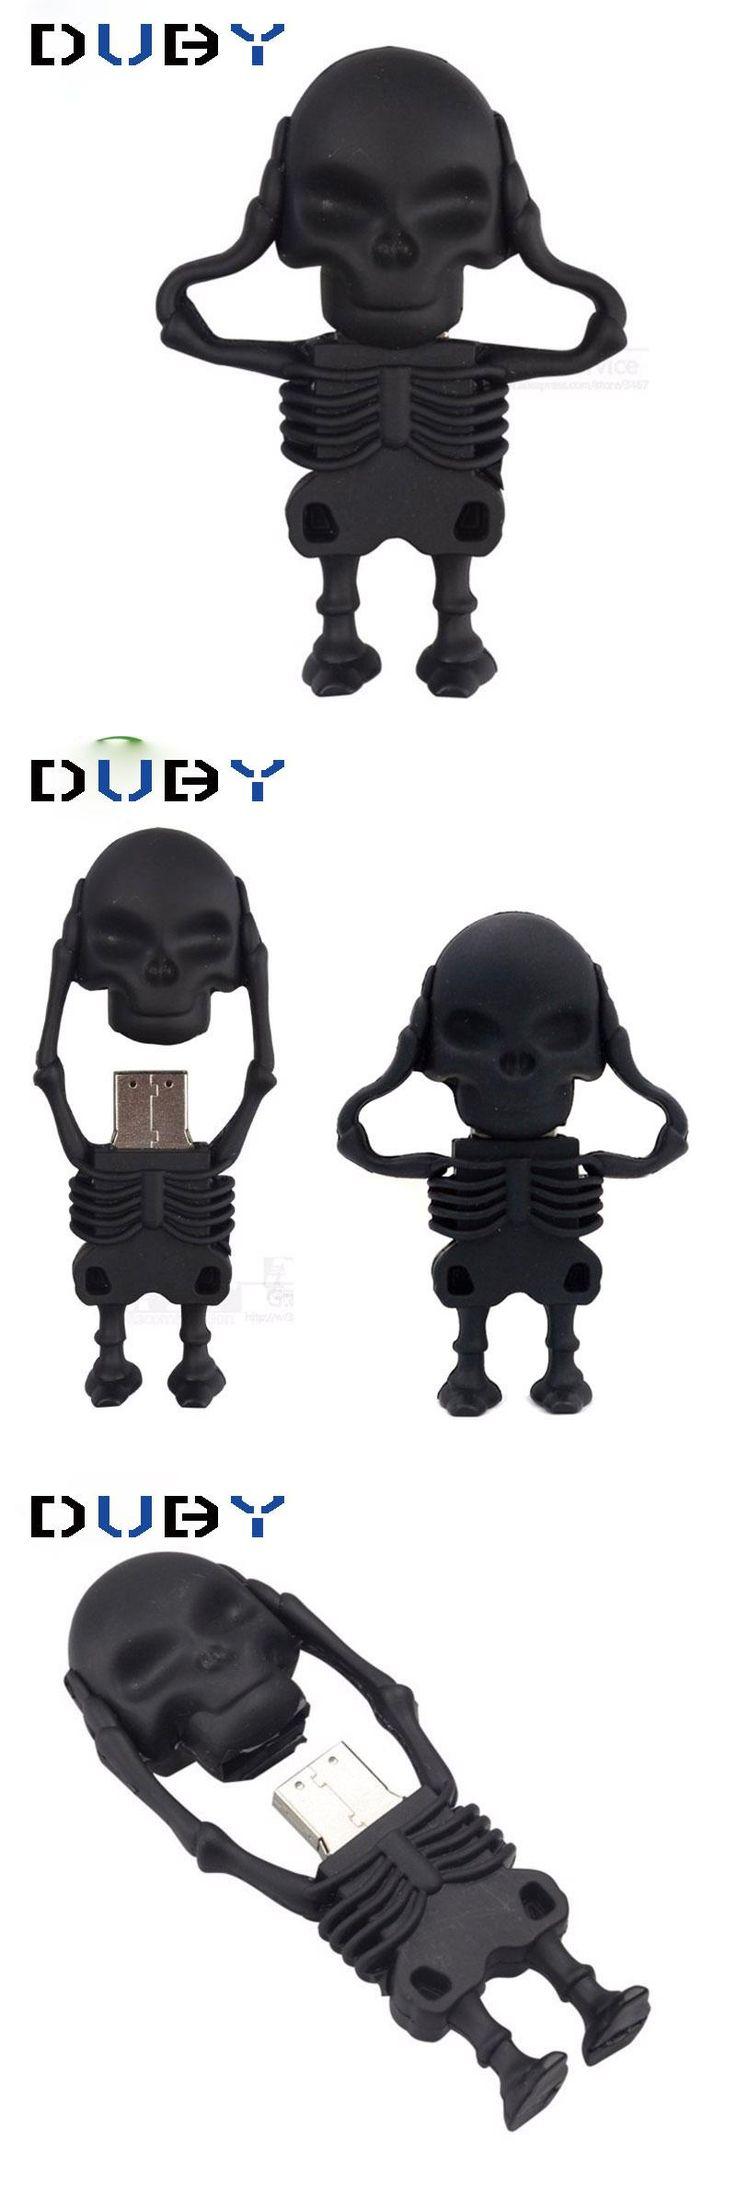 [Visit to Buy] Dr.memory USB Flash Drive Skeleton Pen Drive 16g/8g/4g skull model Memory USB Stick 32gb pendrive cute usb2.0 u disk 2016 new #Advertisement